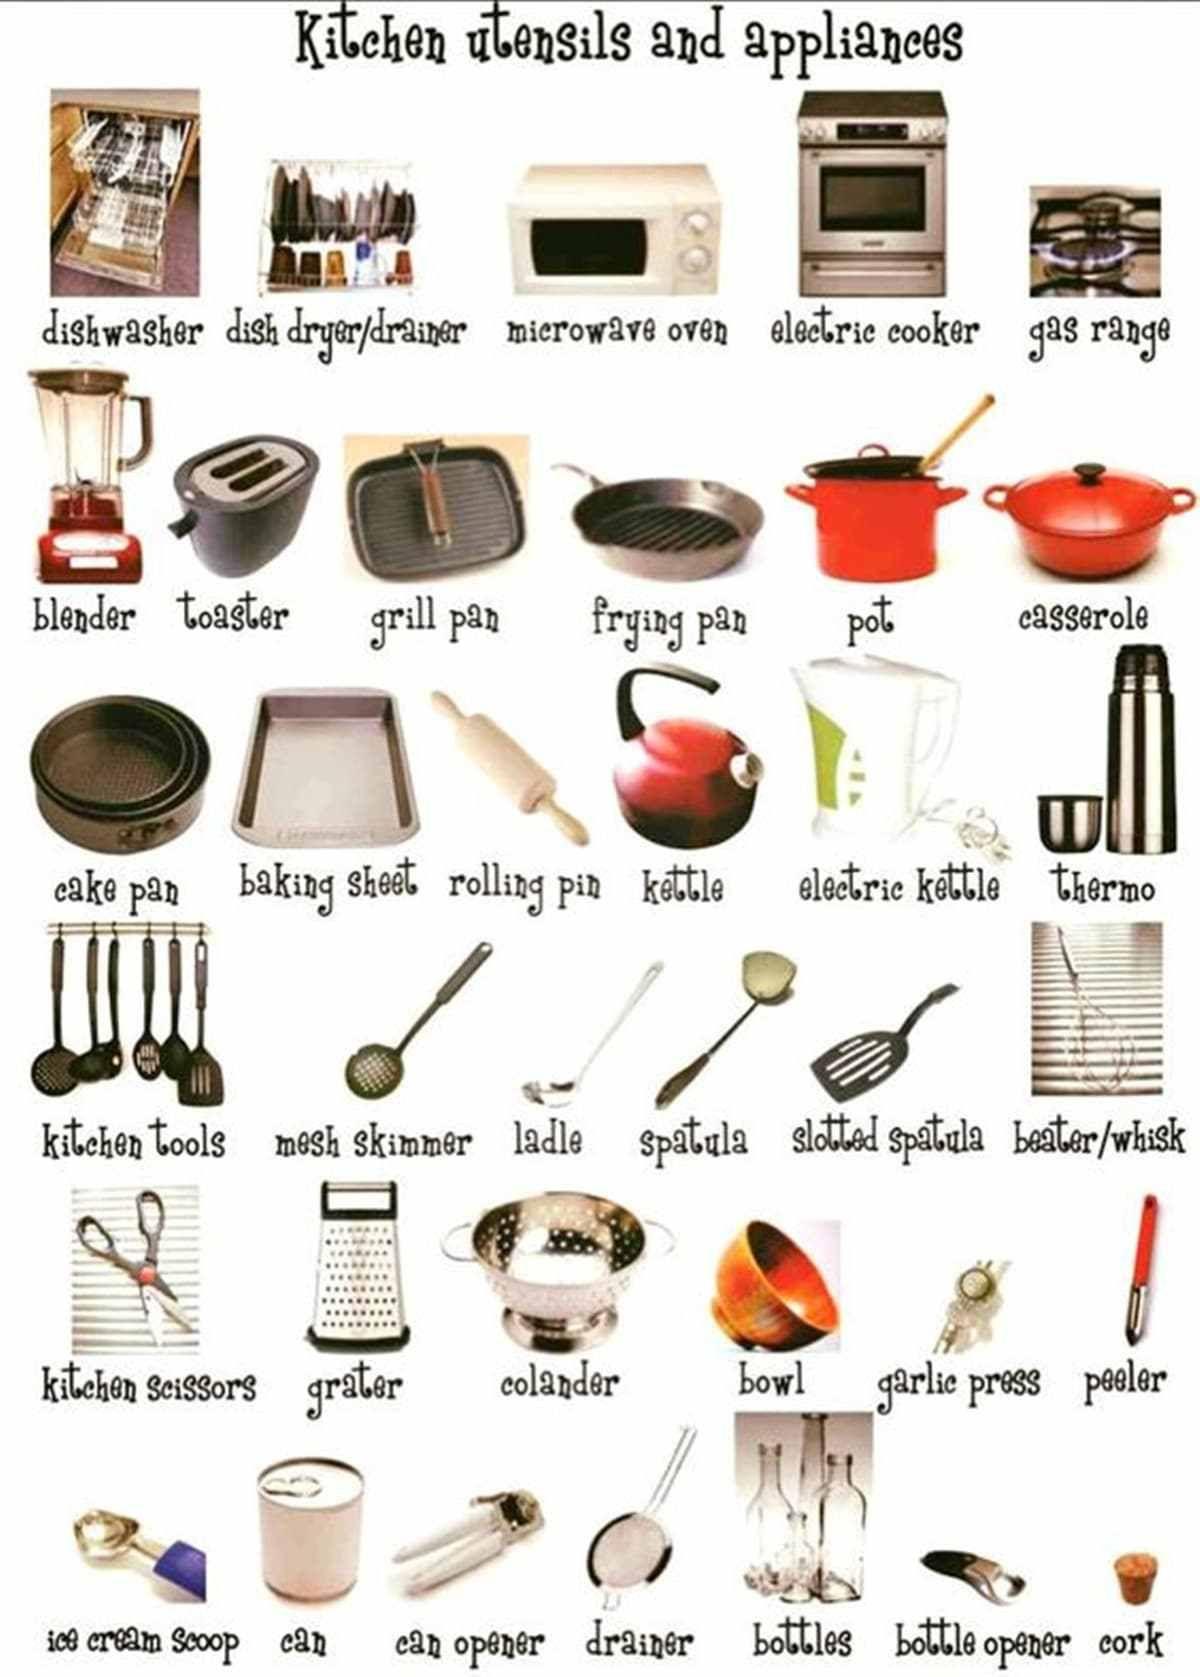 In The Kitchen Vocabulary Kitchen Utensils Amp Cooking